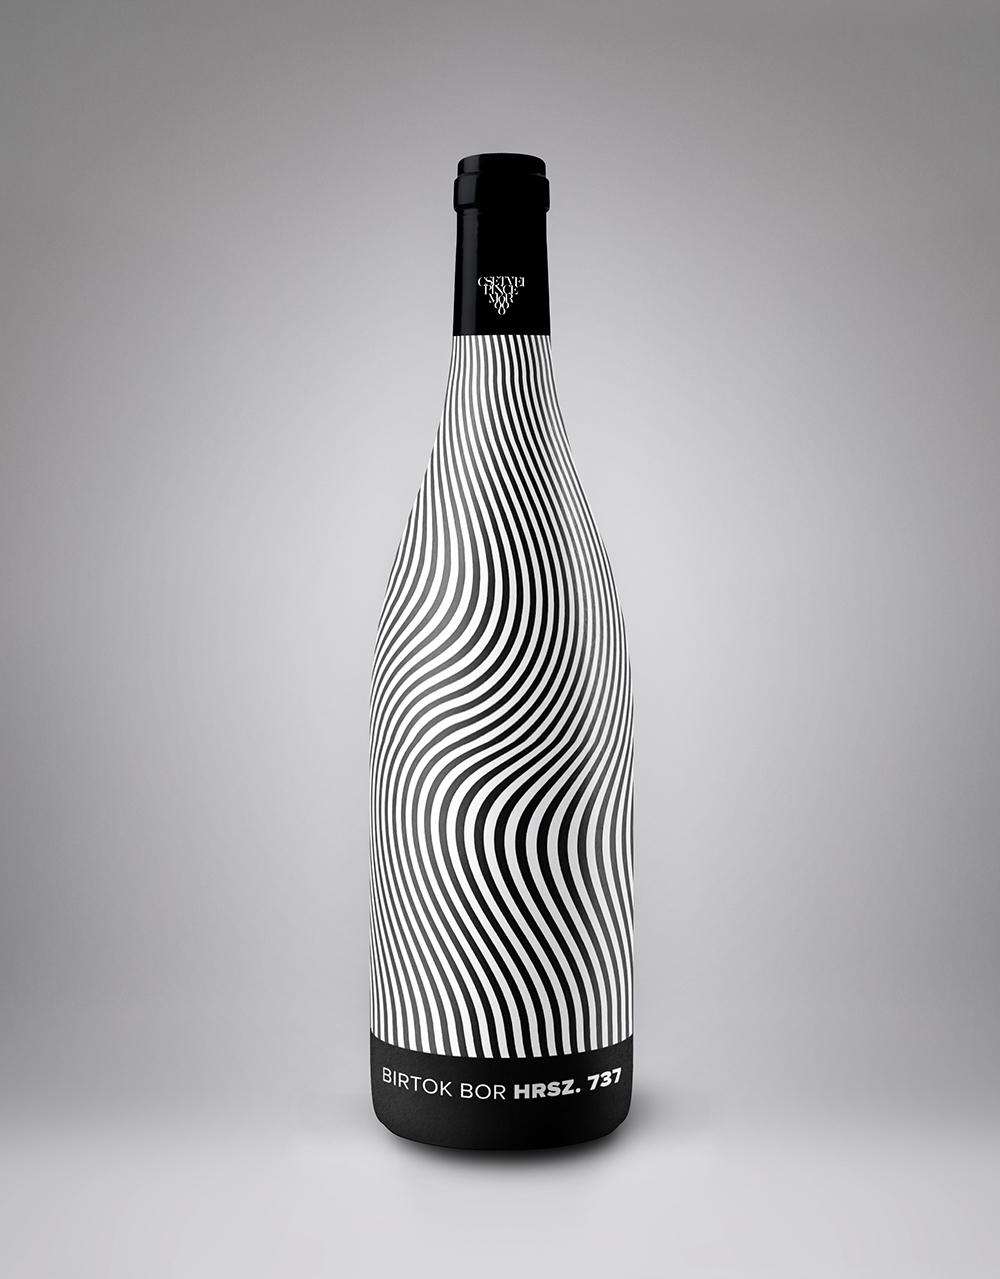 Hrsz 737 Wine Label Concept Penang Website Digital And Graphic